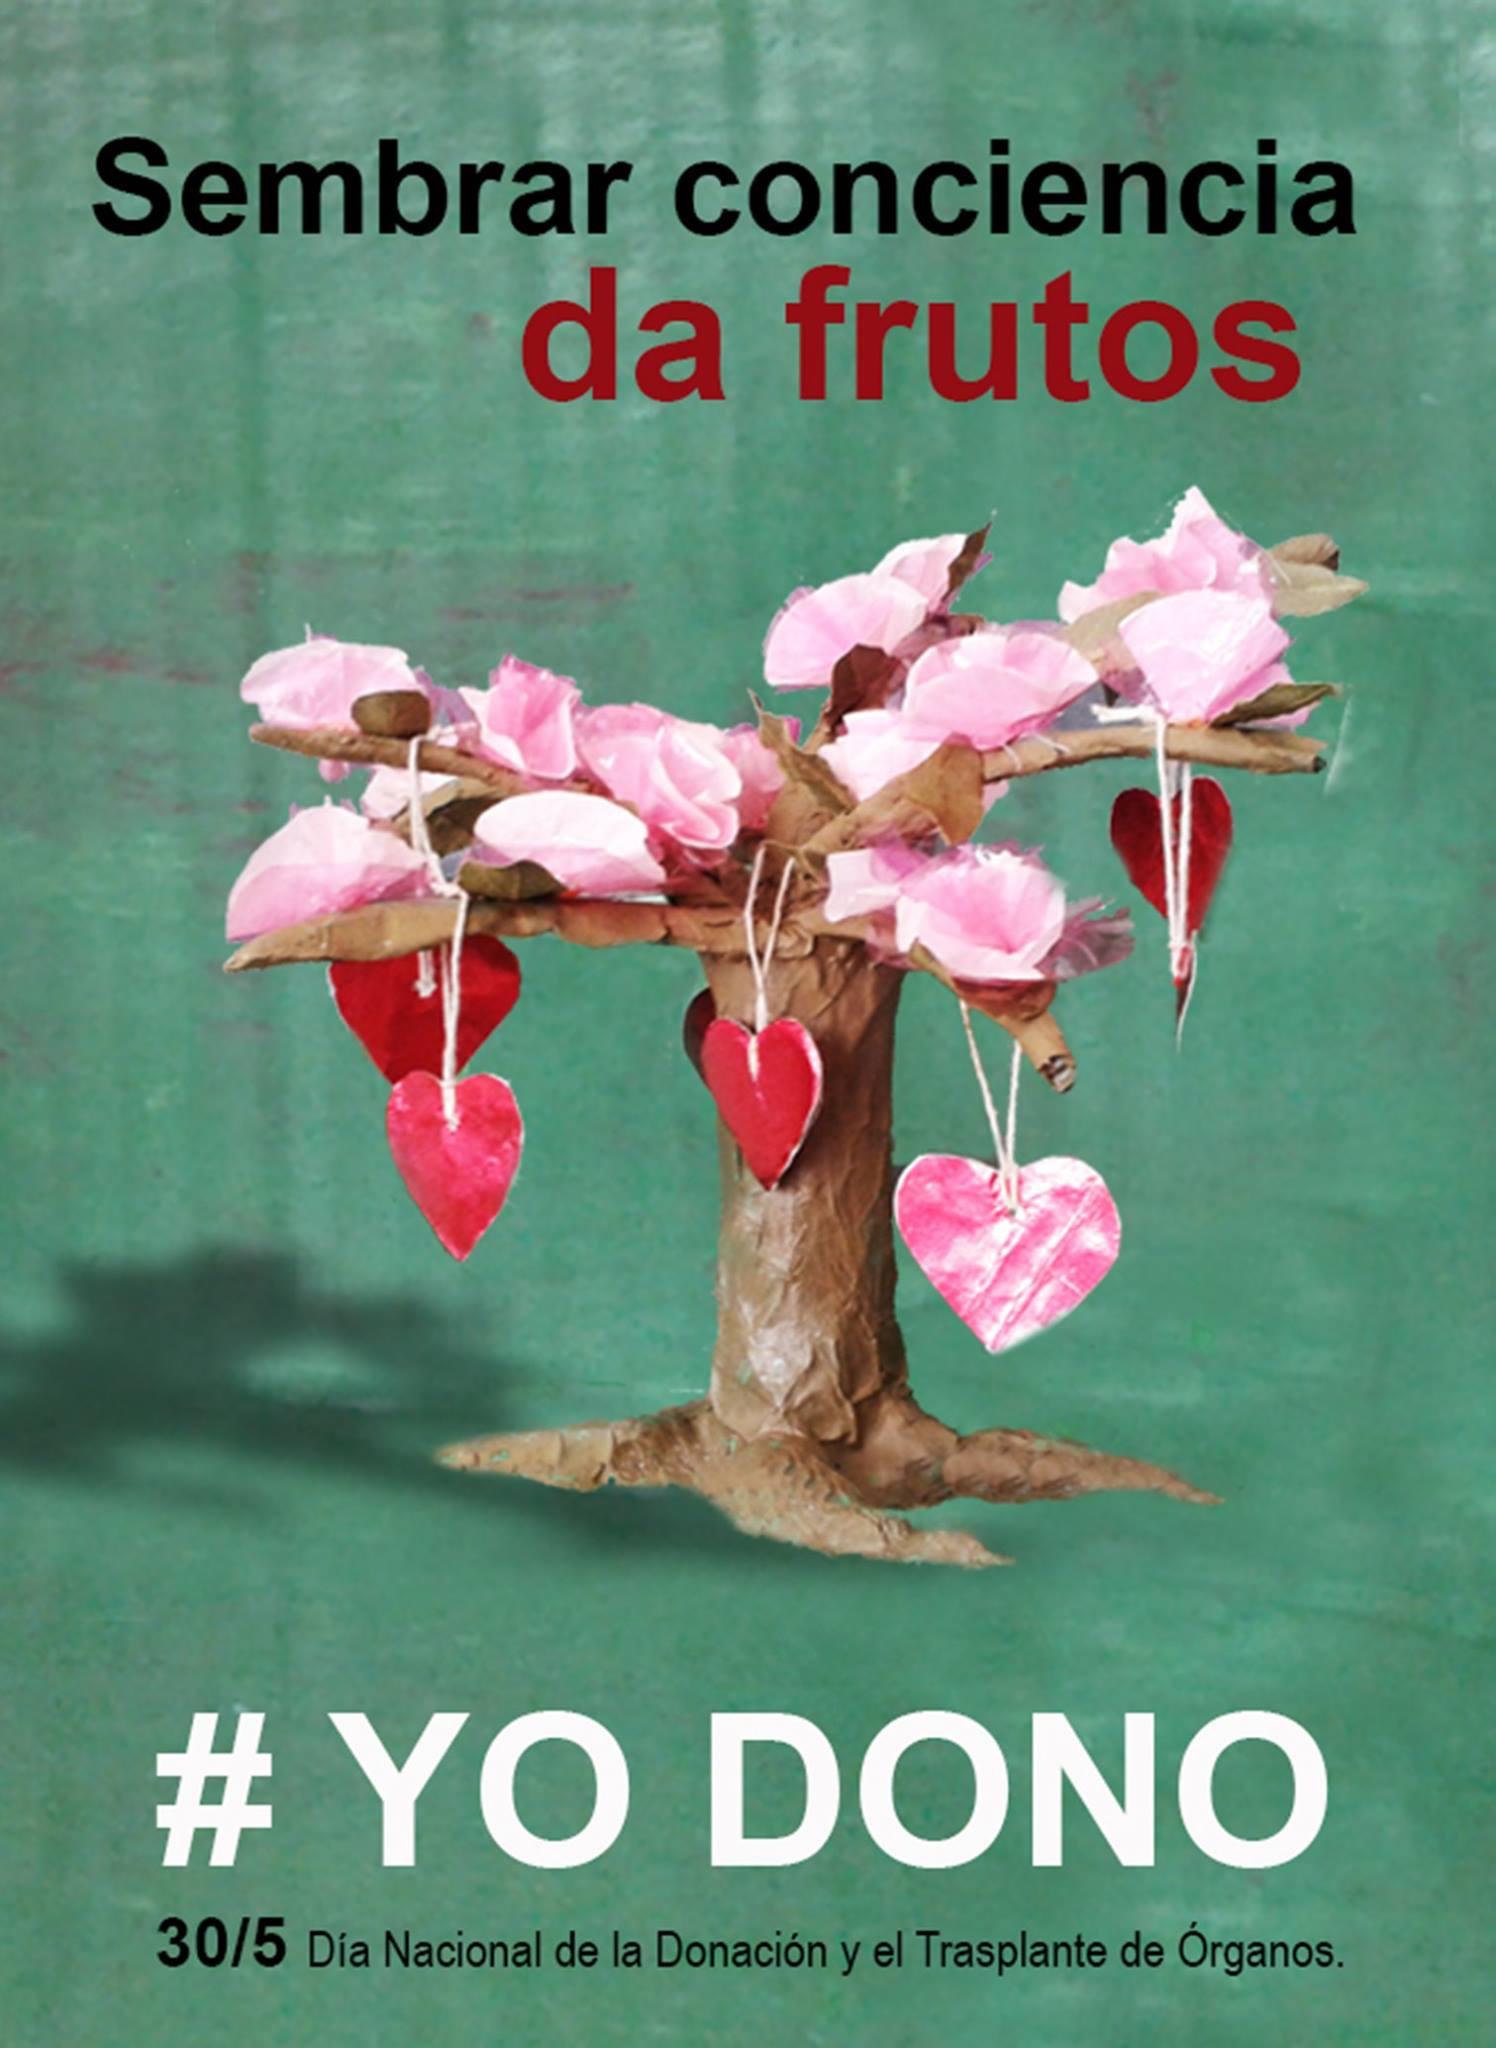 30-05-2016 - donación de órganos3